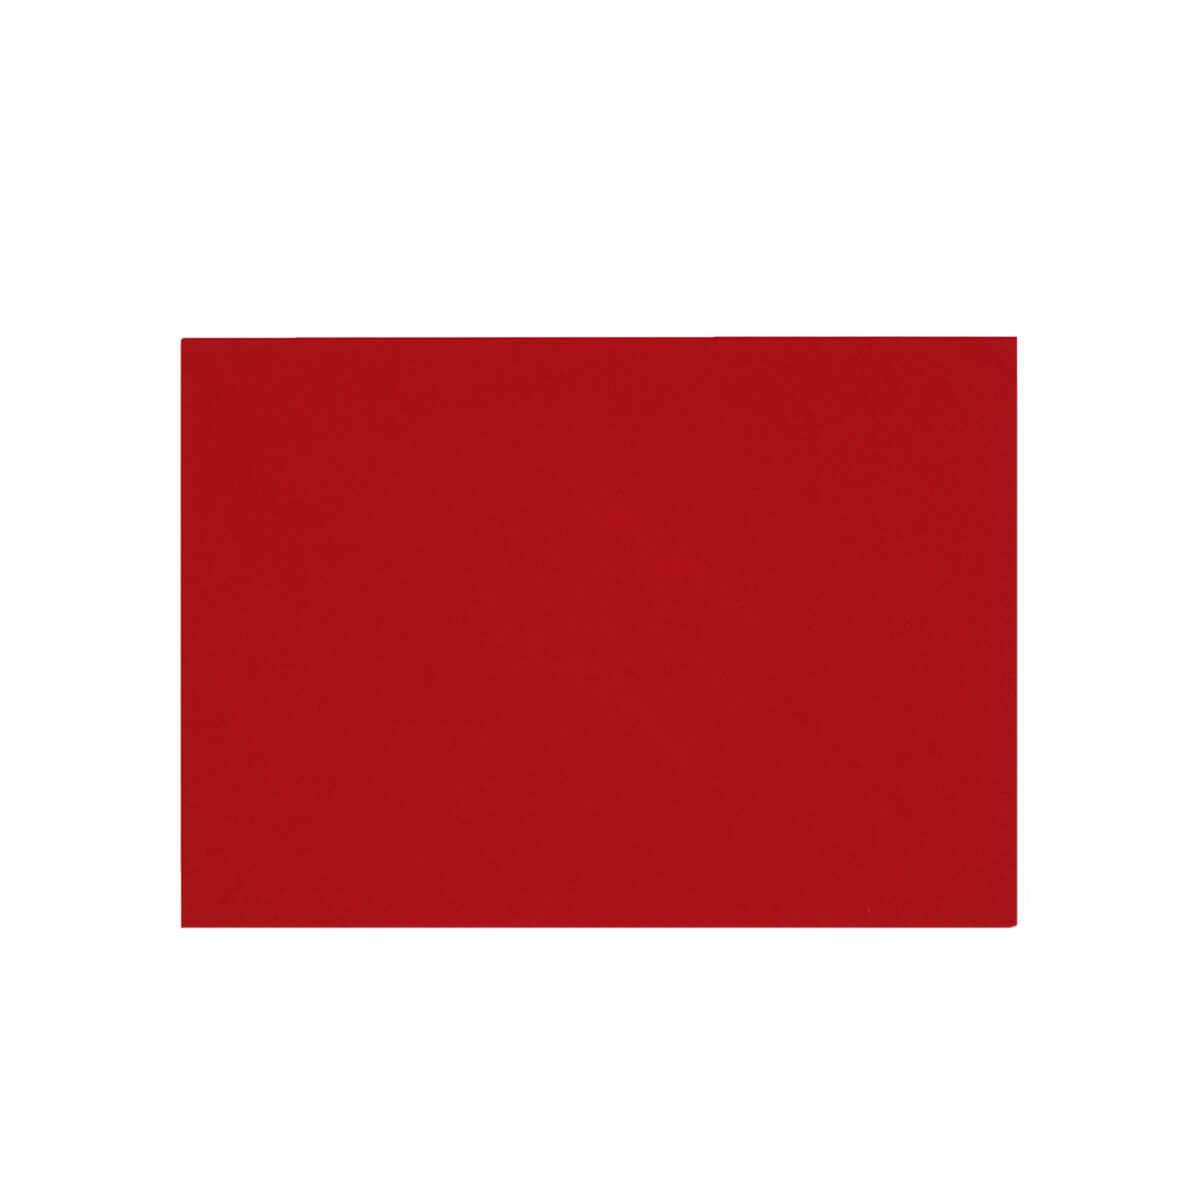 DARK RED 152 x 216mm ENVELOPES 120GSM